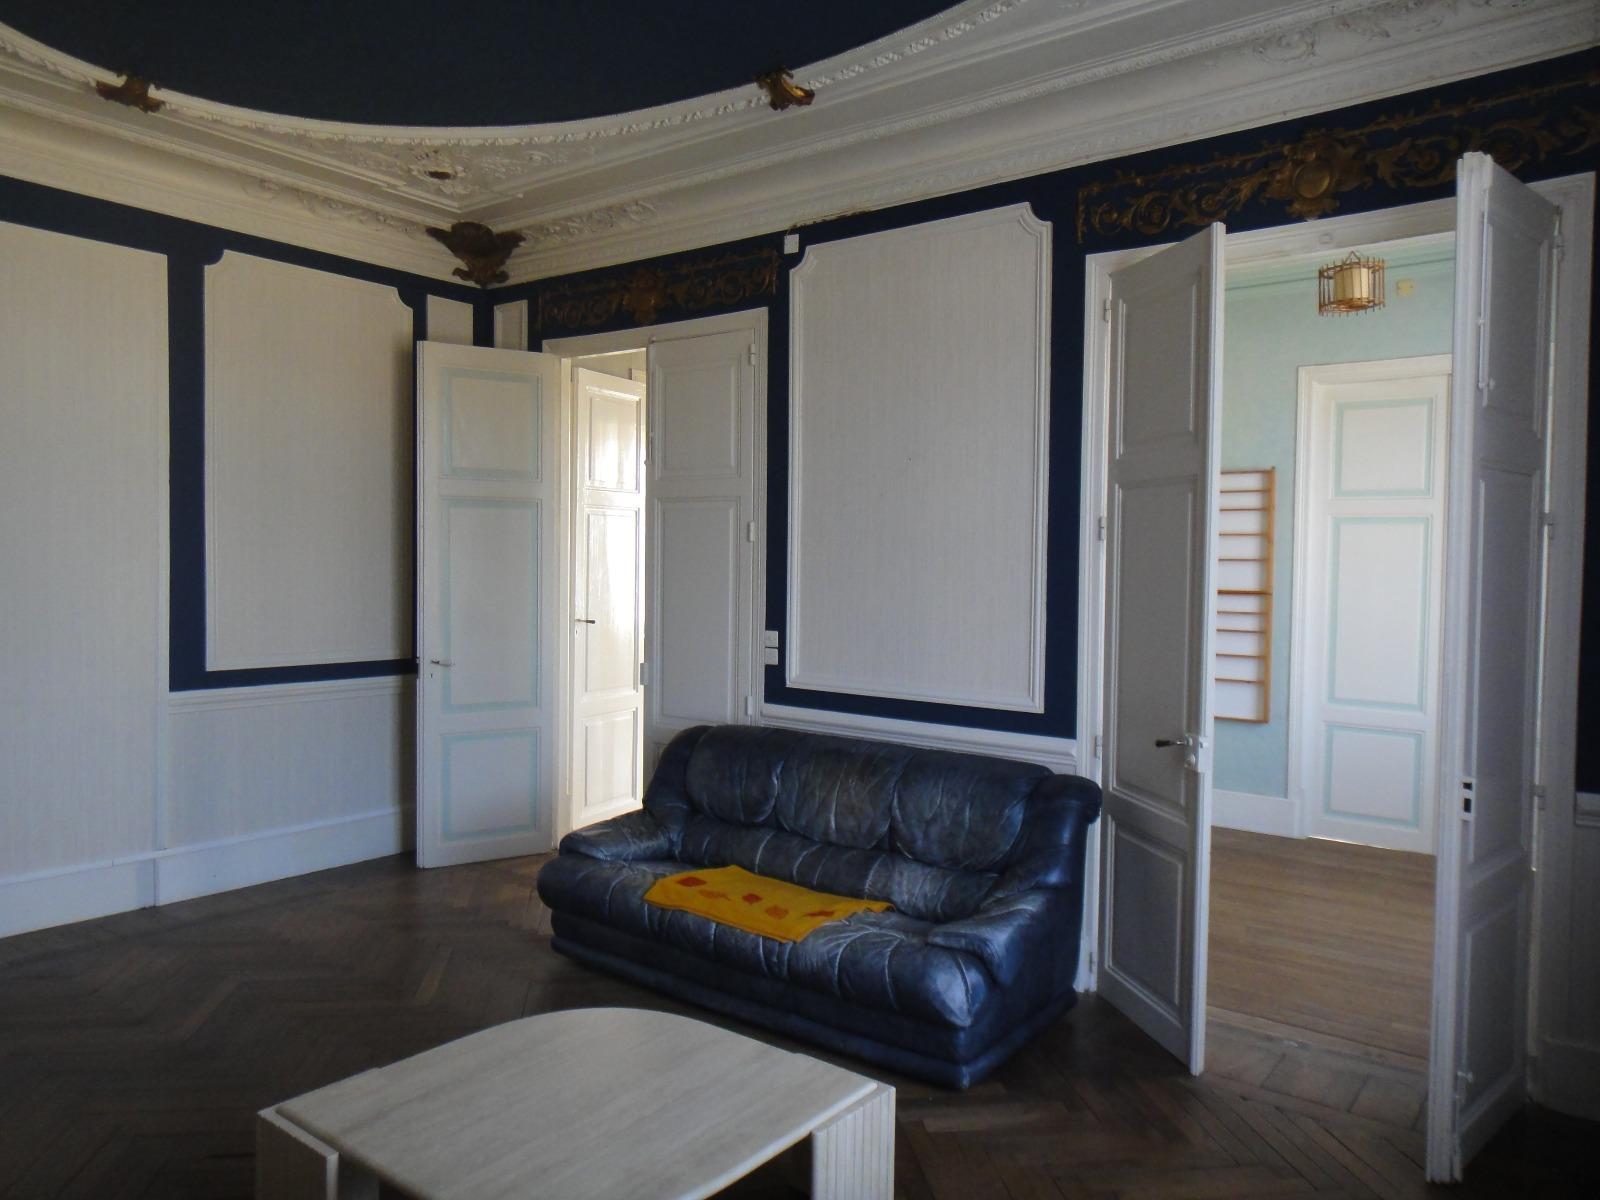 vente maison bourgeoise ann es 1900. Black Bedroom Furniture Sets. Home Design Ideas